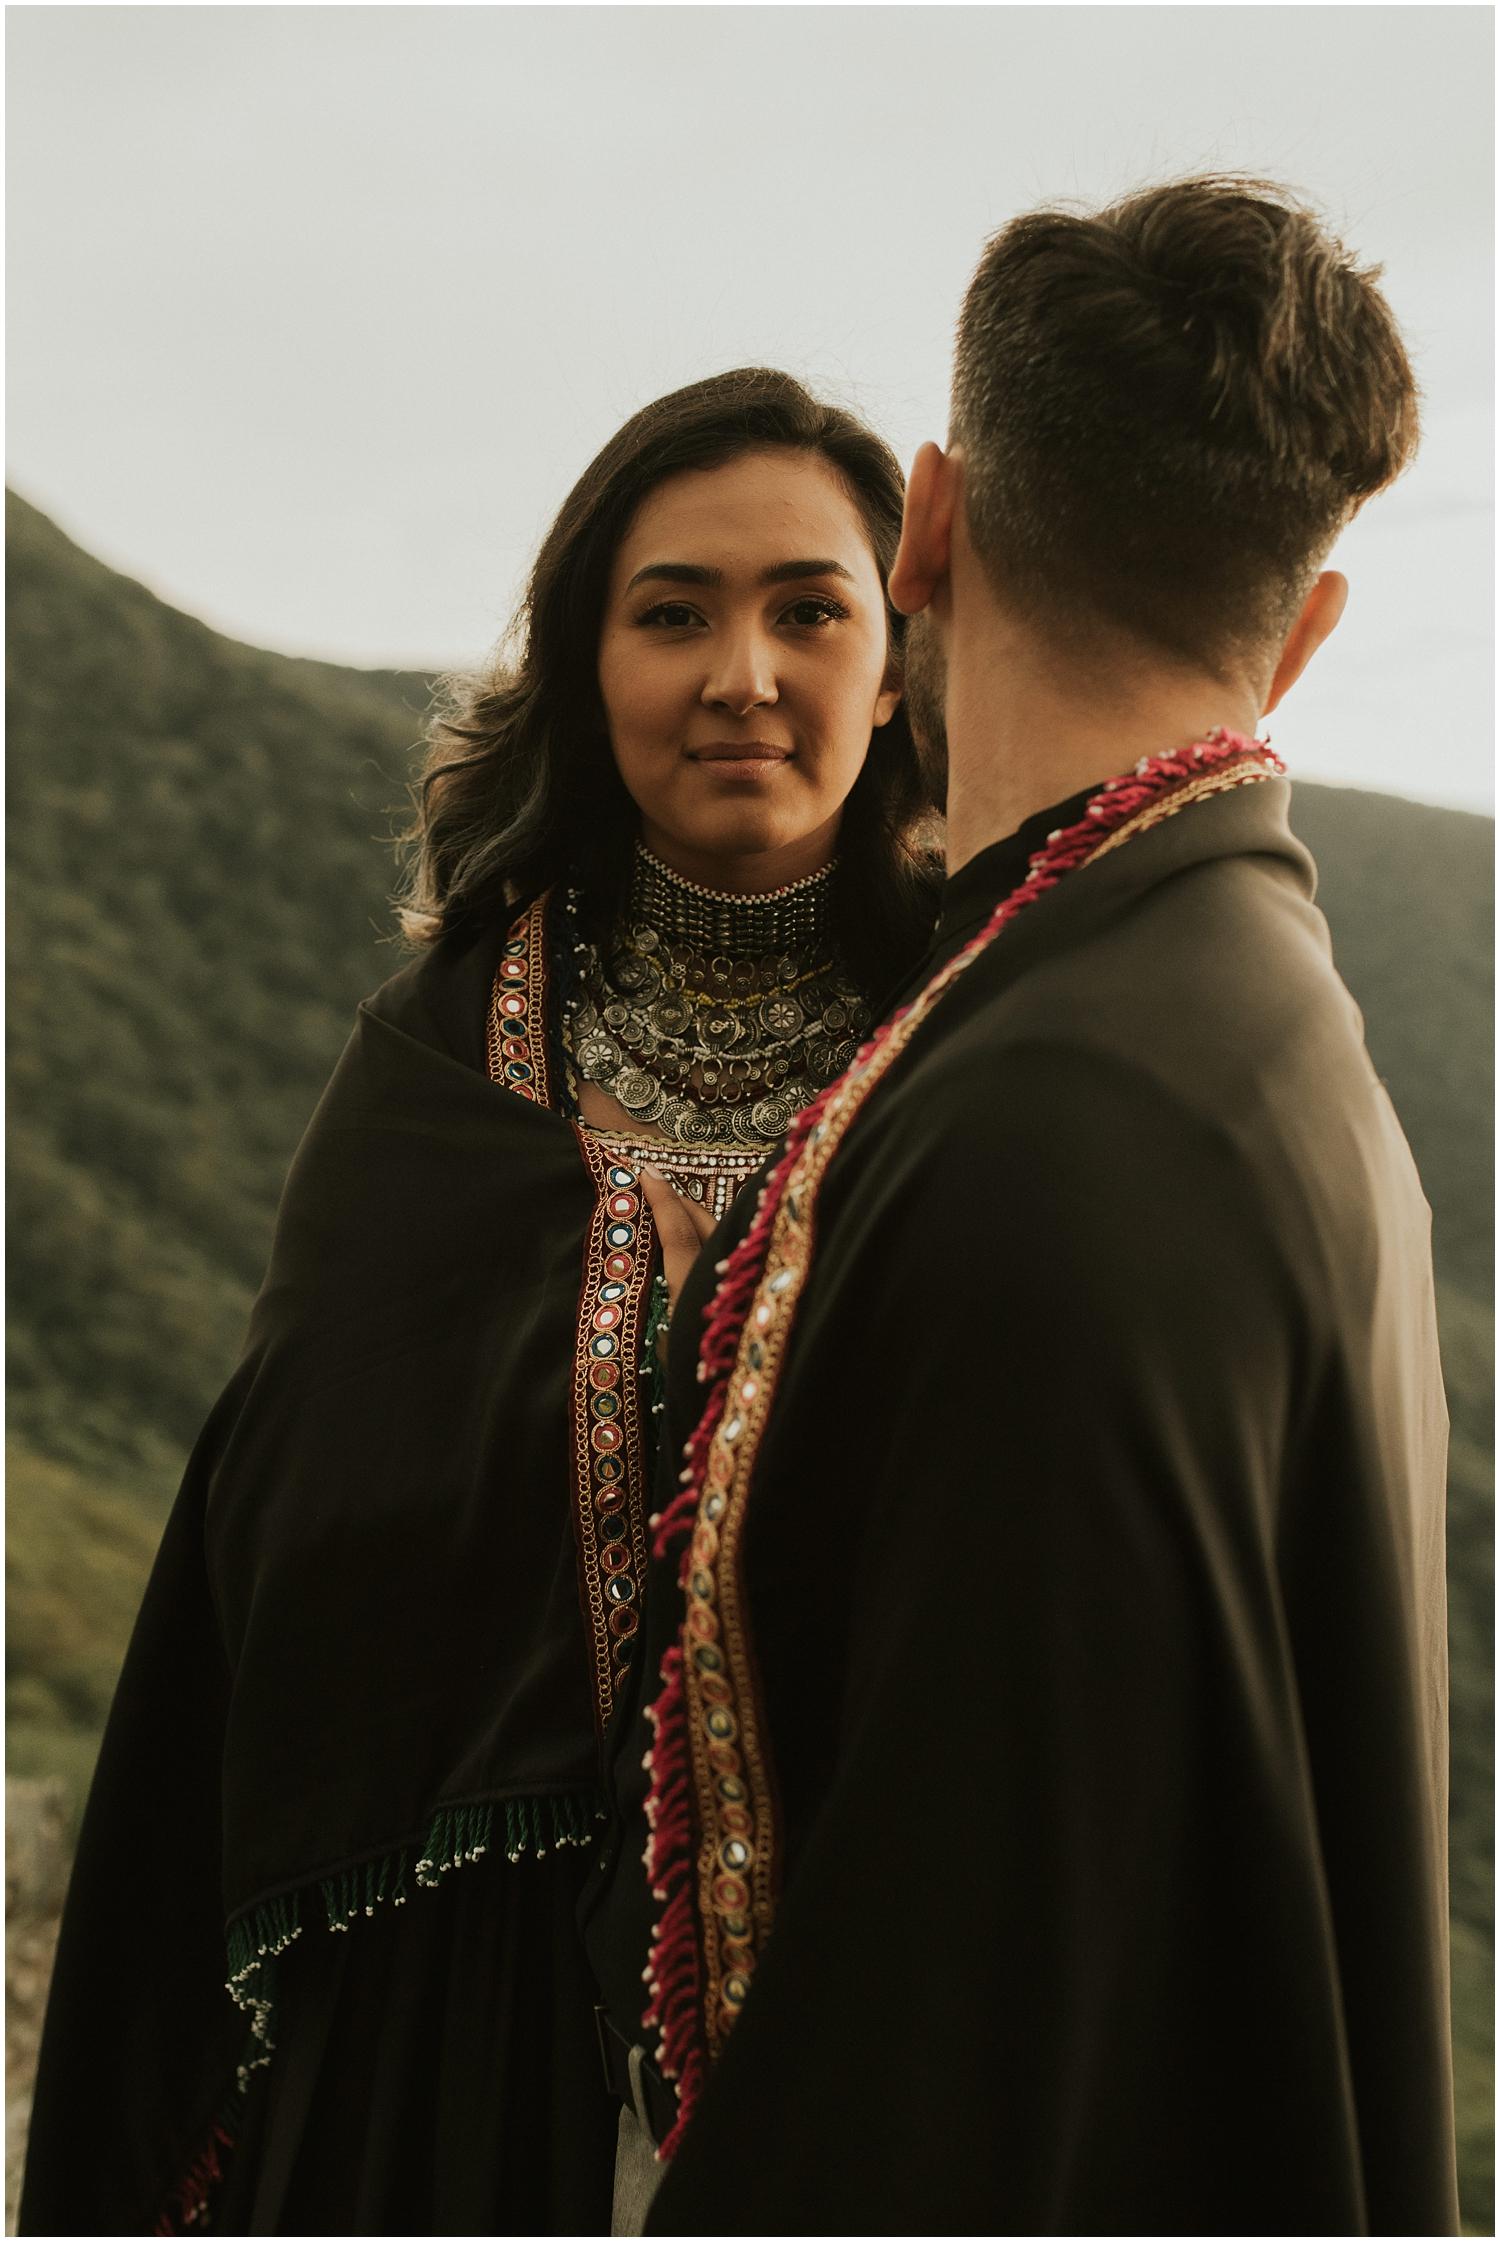 Hannah_Baldwin_Photography_Bears_Den_Overlook_Mountain_engagement_Session_0094.jpg